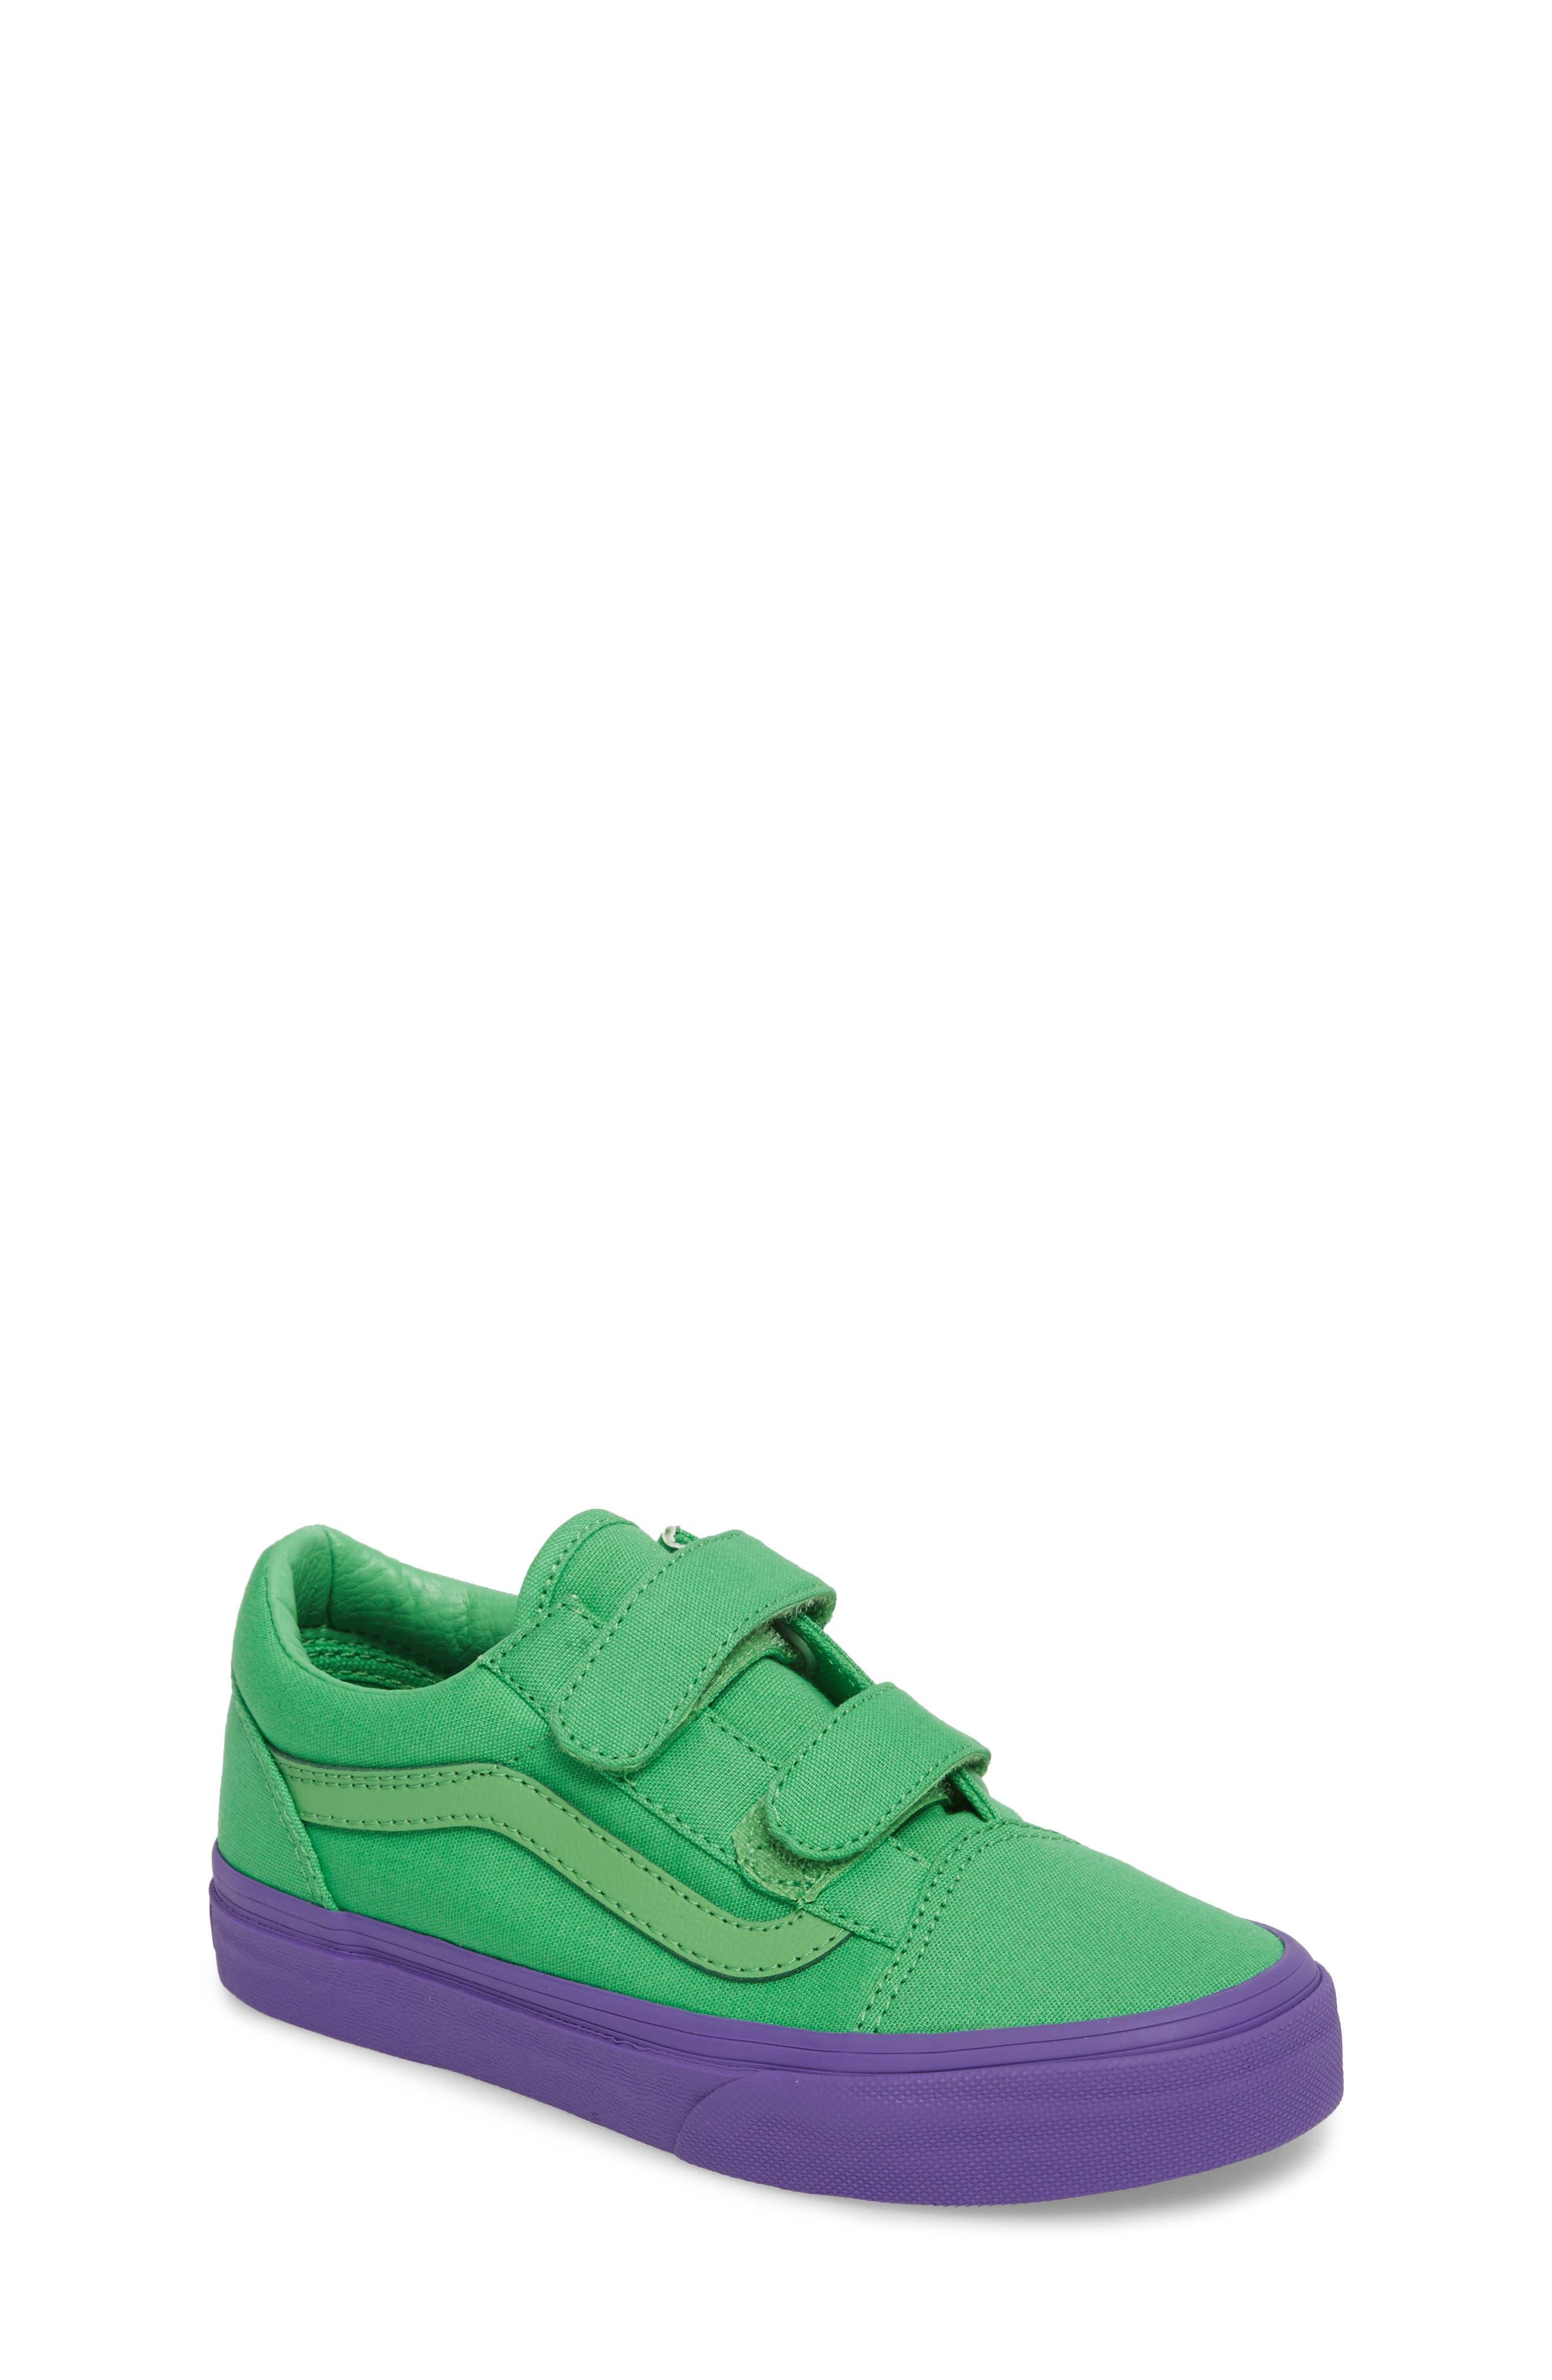 VANS,                             Old Skool V Sneaker,                             Main thumbnail 1, color,                             310